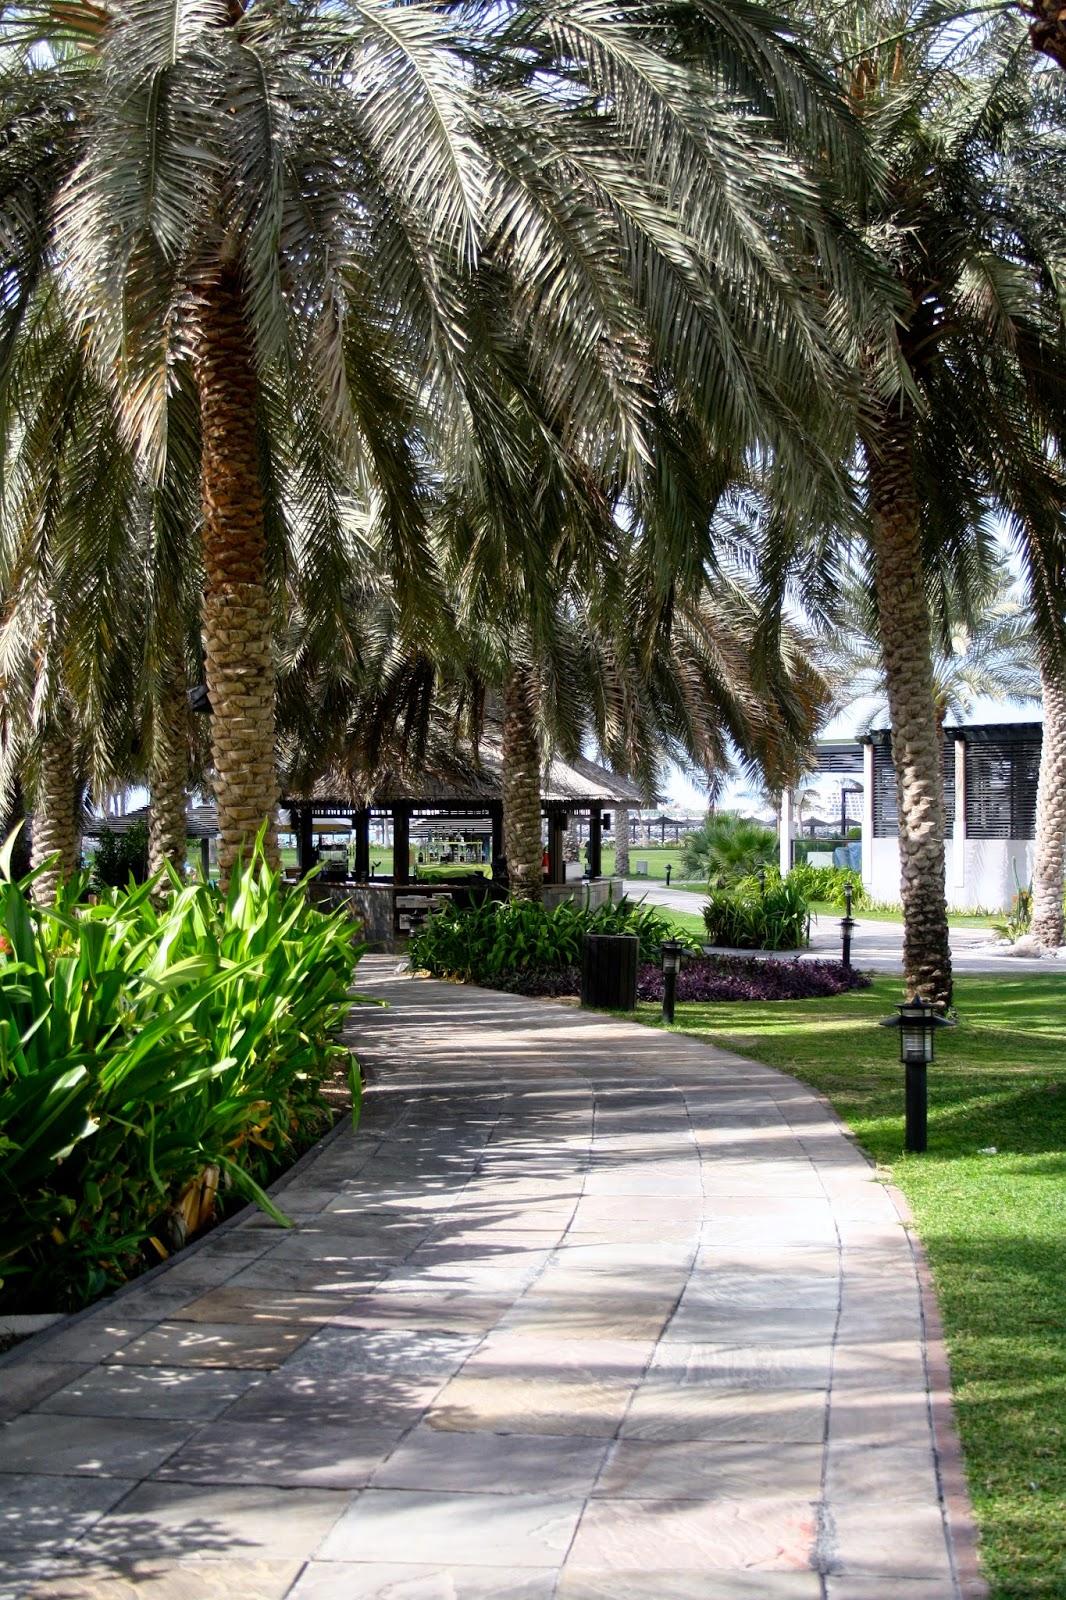 DUBAI PHOTO DIARY I. 14